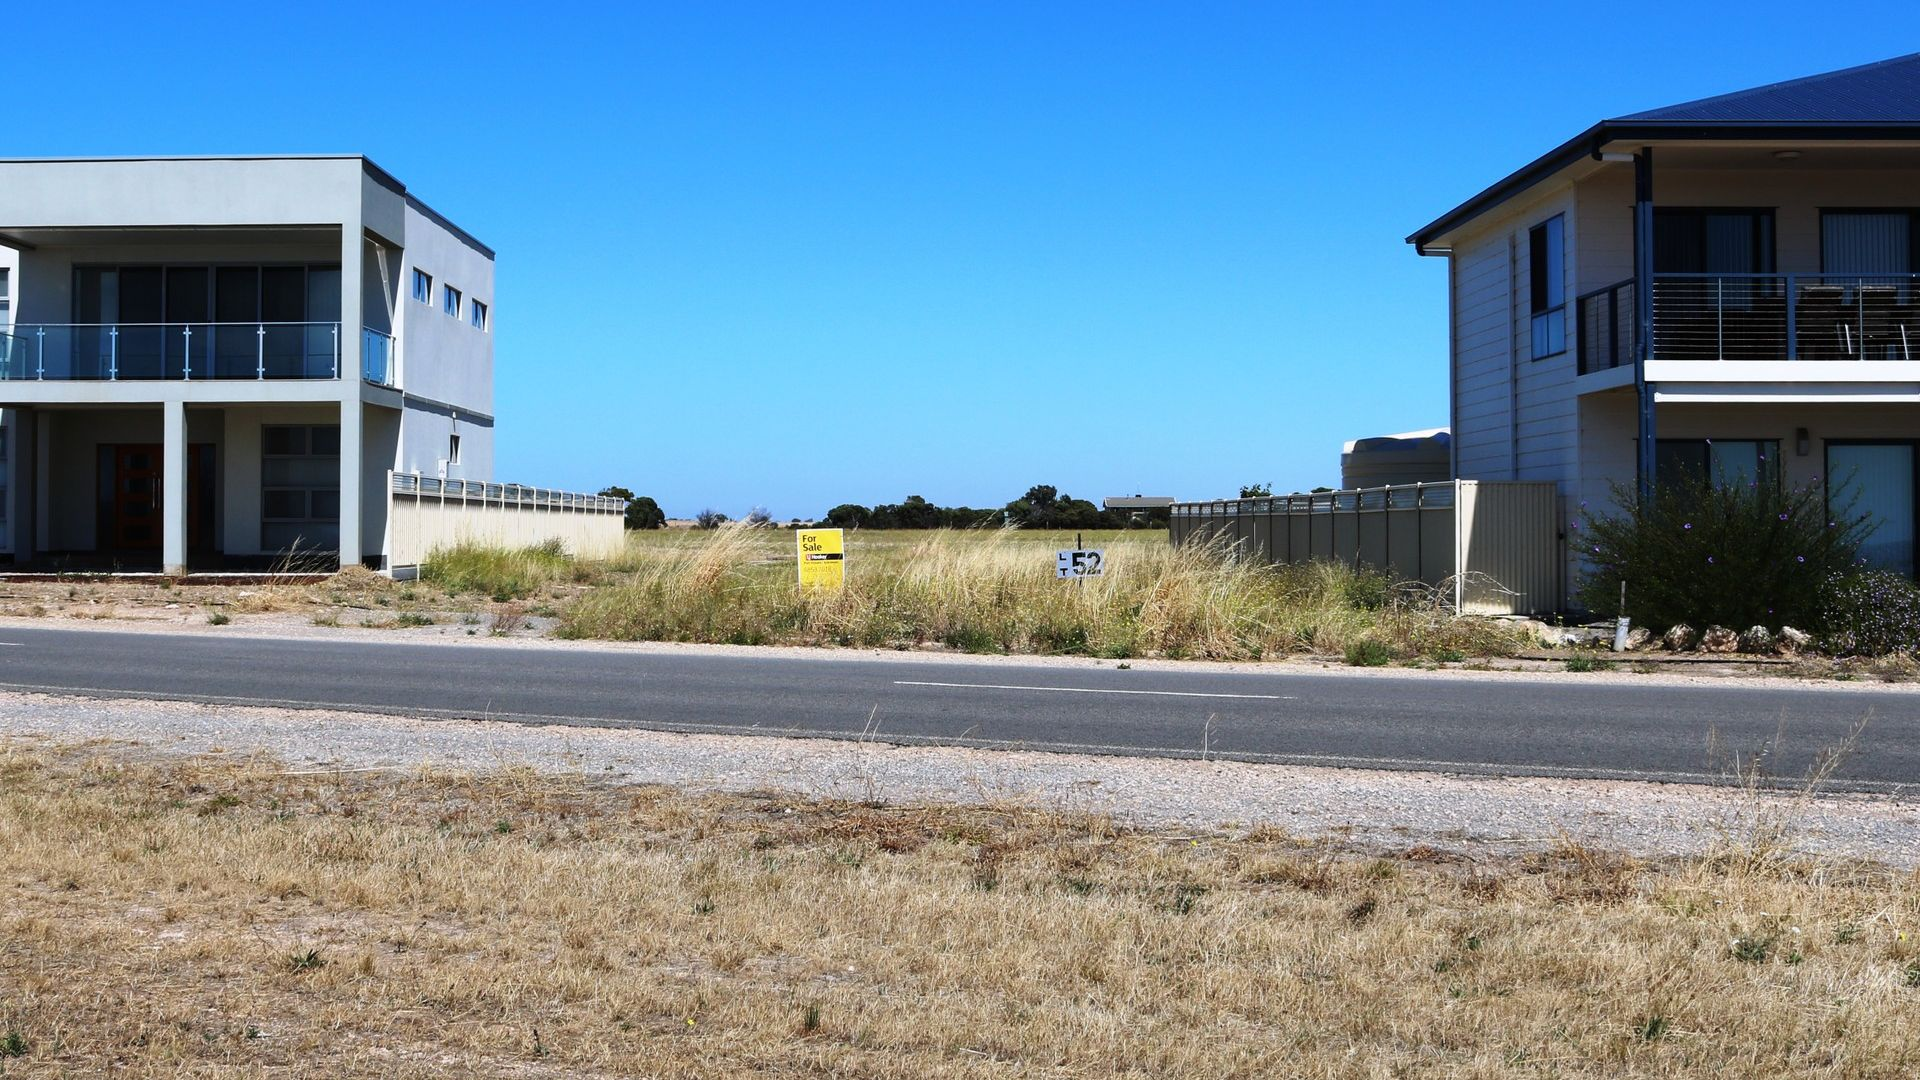 52/21 Sultana Point Rd, Edithburgh SA 5583, Image 2